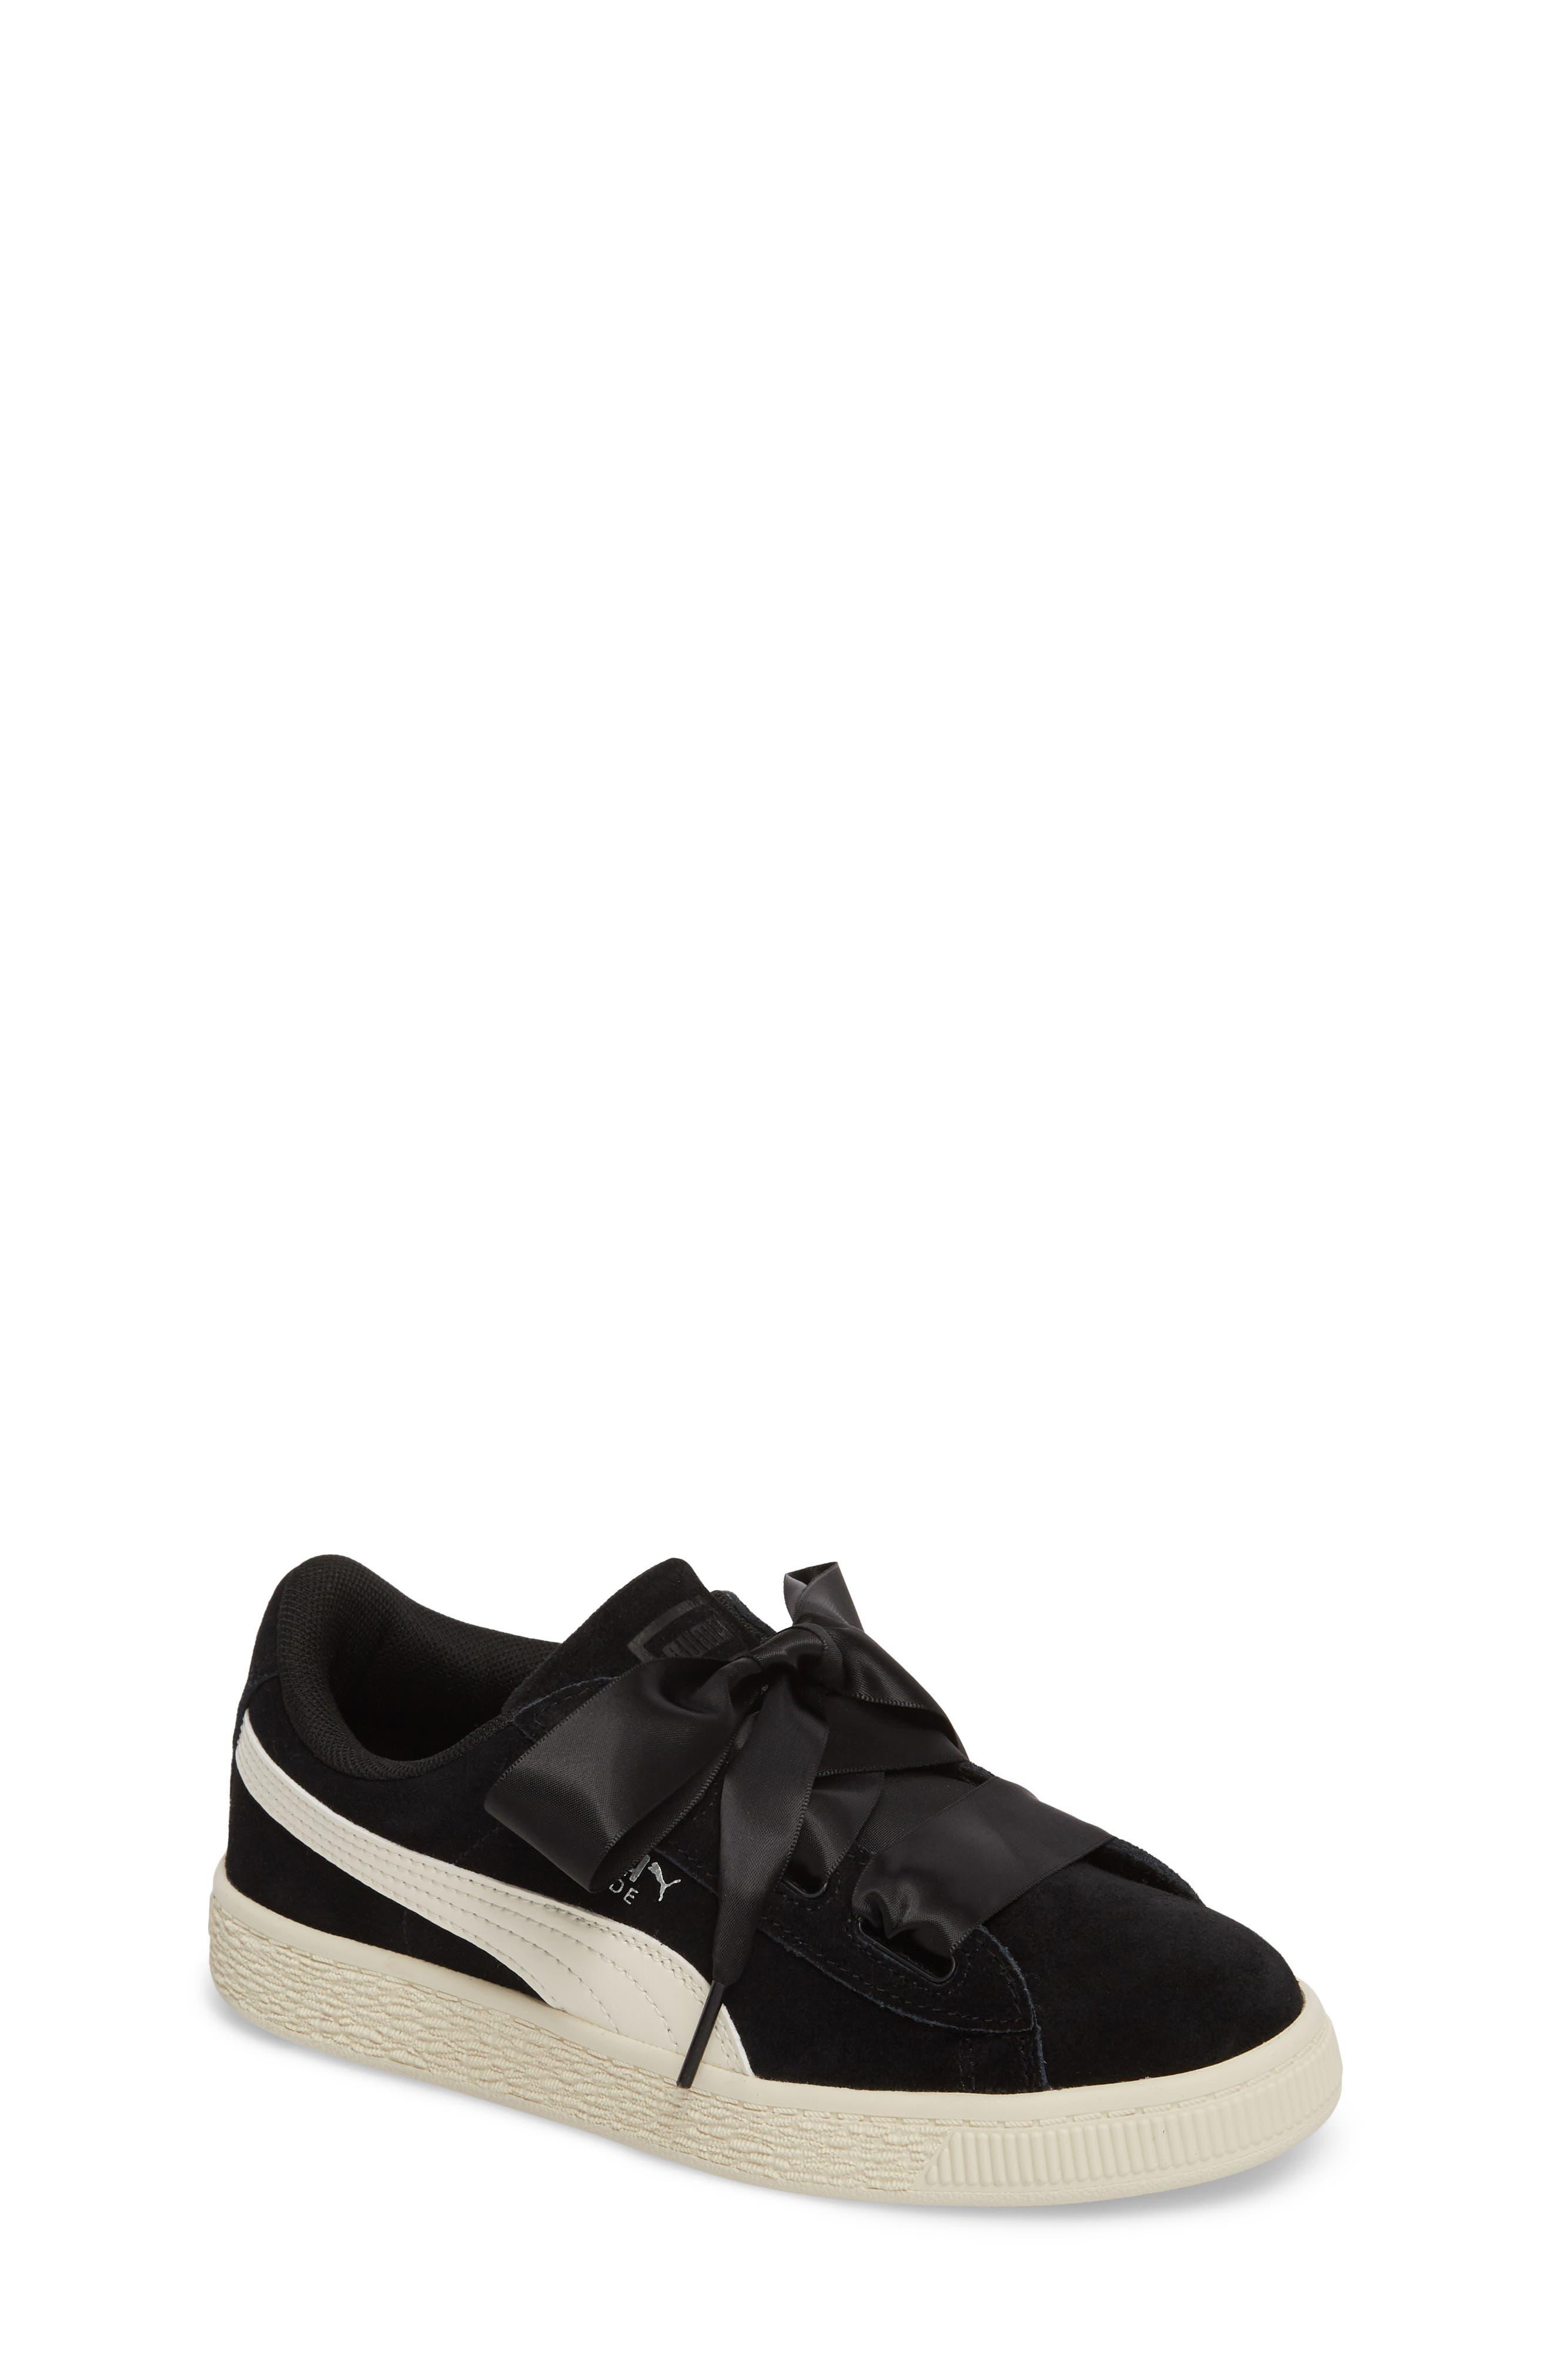 Suede Heart Sneaker,                             Main thumbnail 1, color,                             Puma Black/ Whisper White